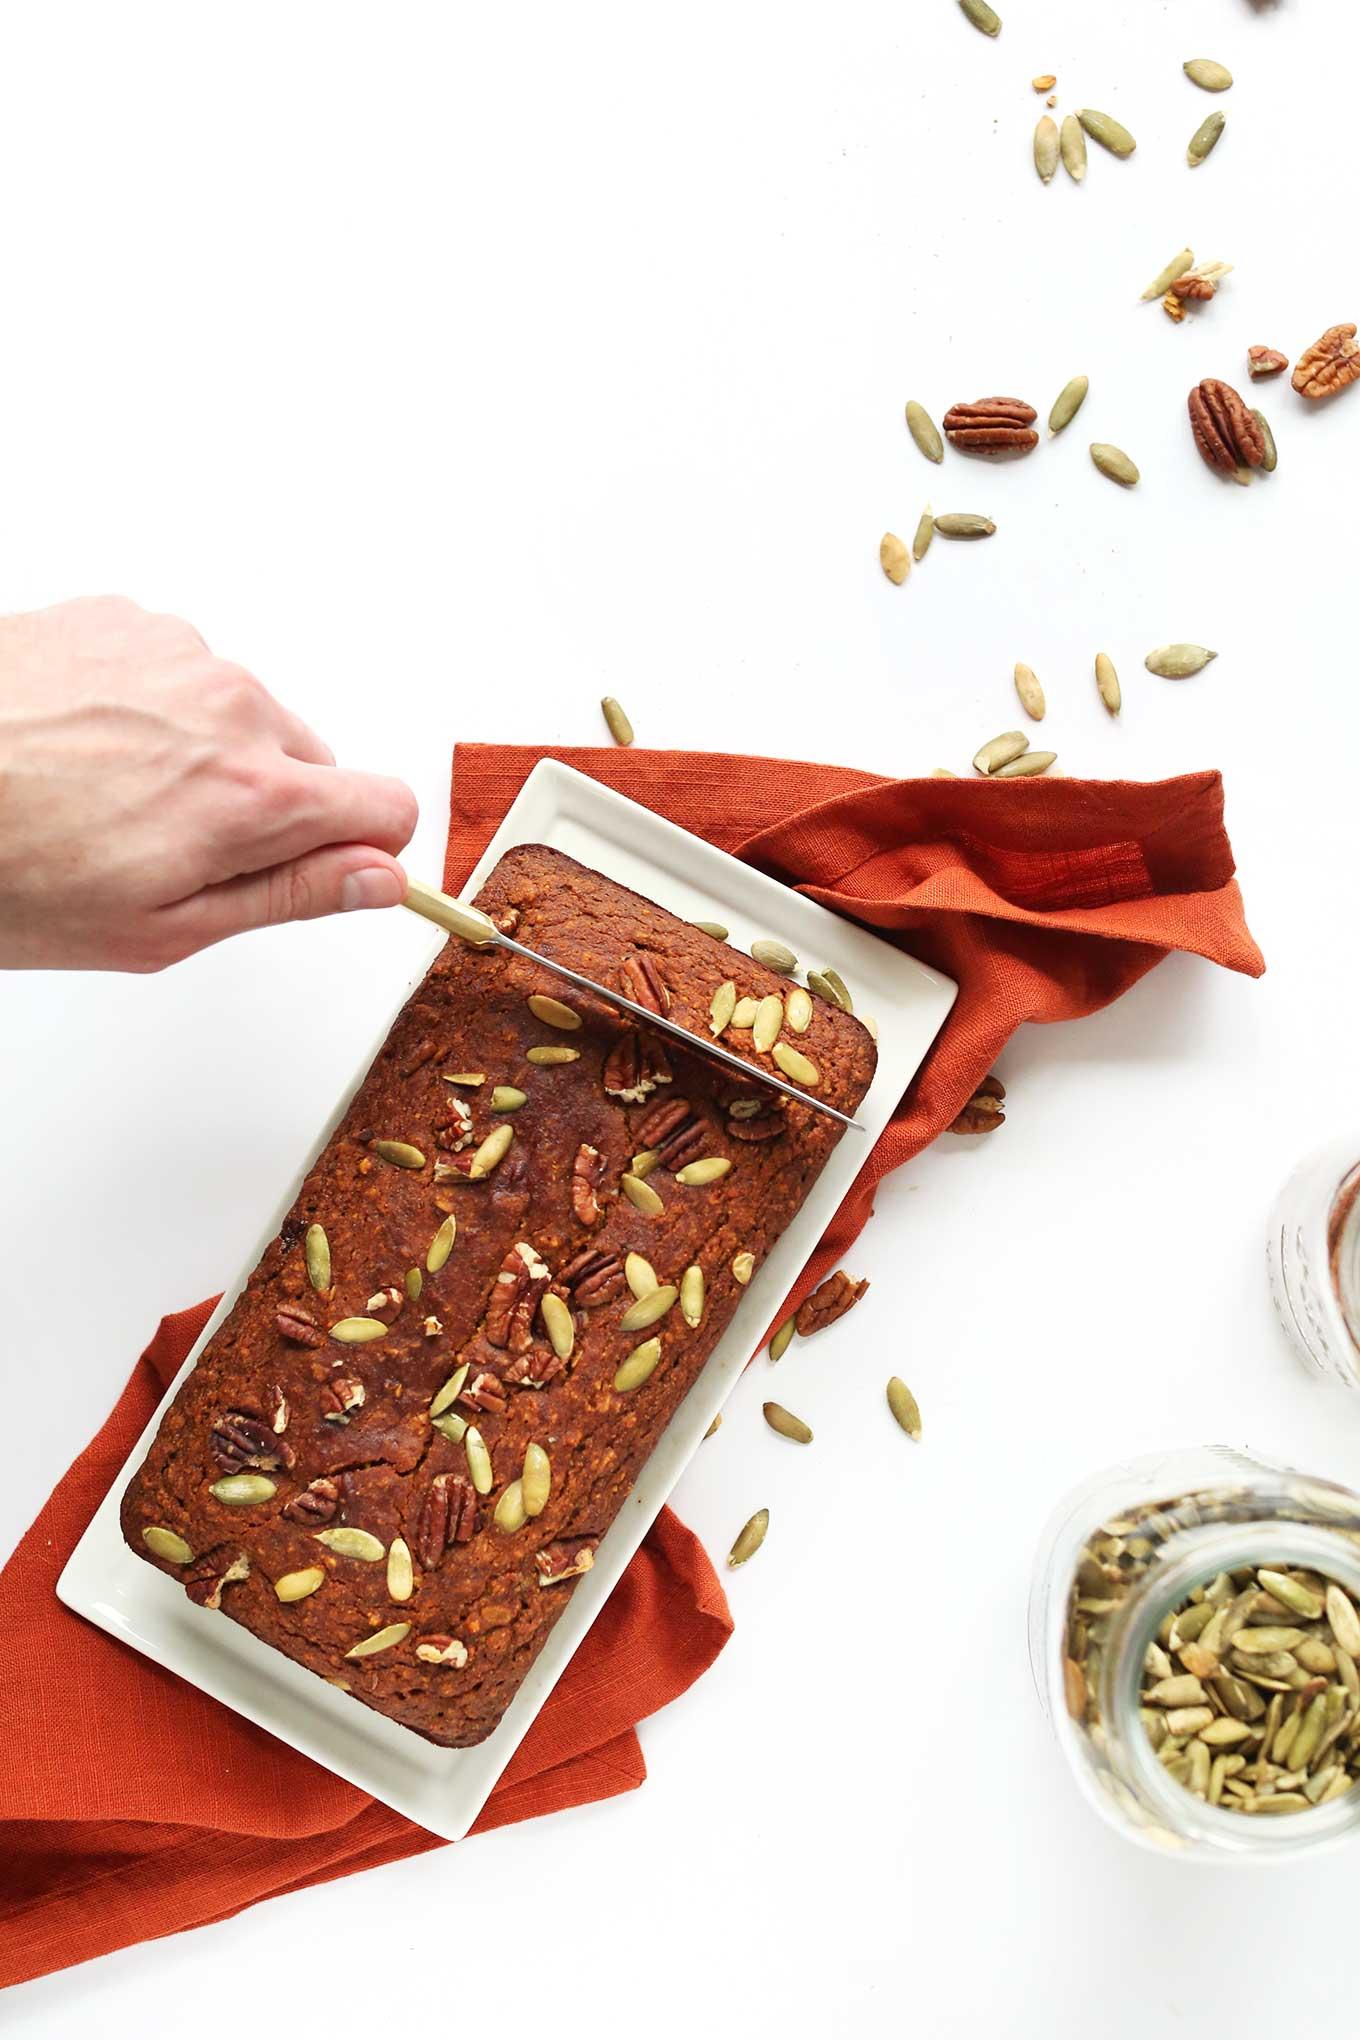 Slicing into a loaf of Vegan Gluten-Free Pumpkin Bread